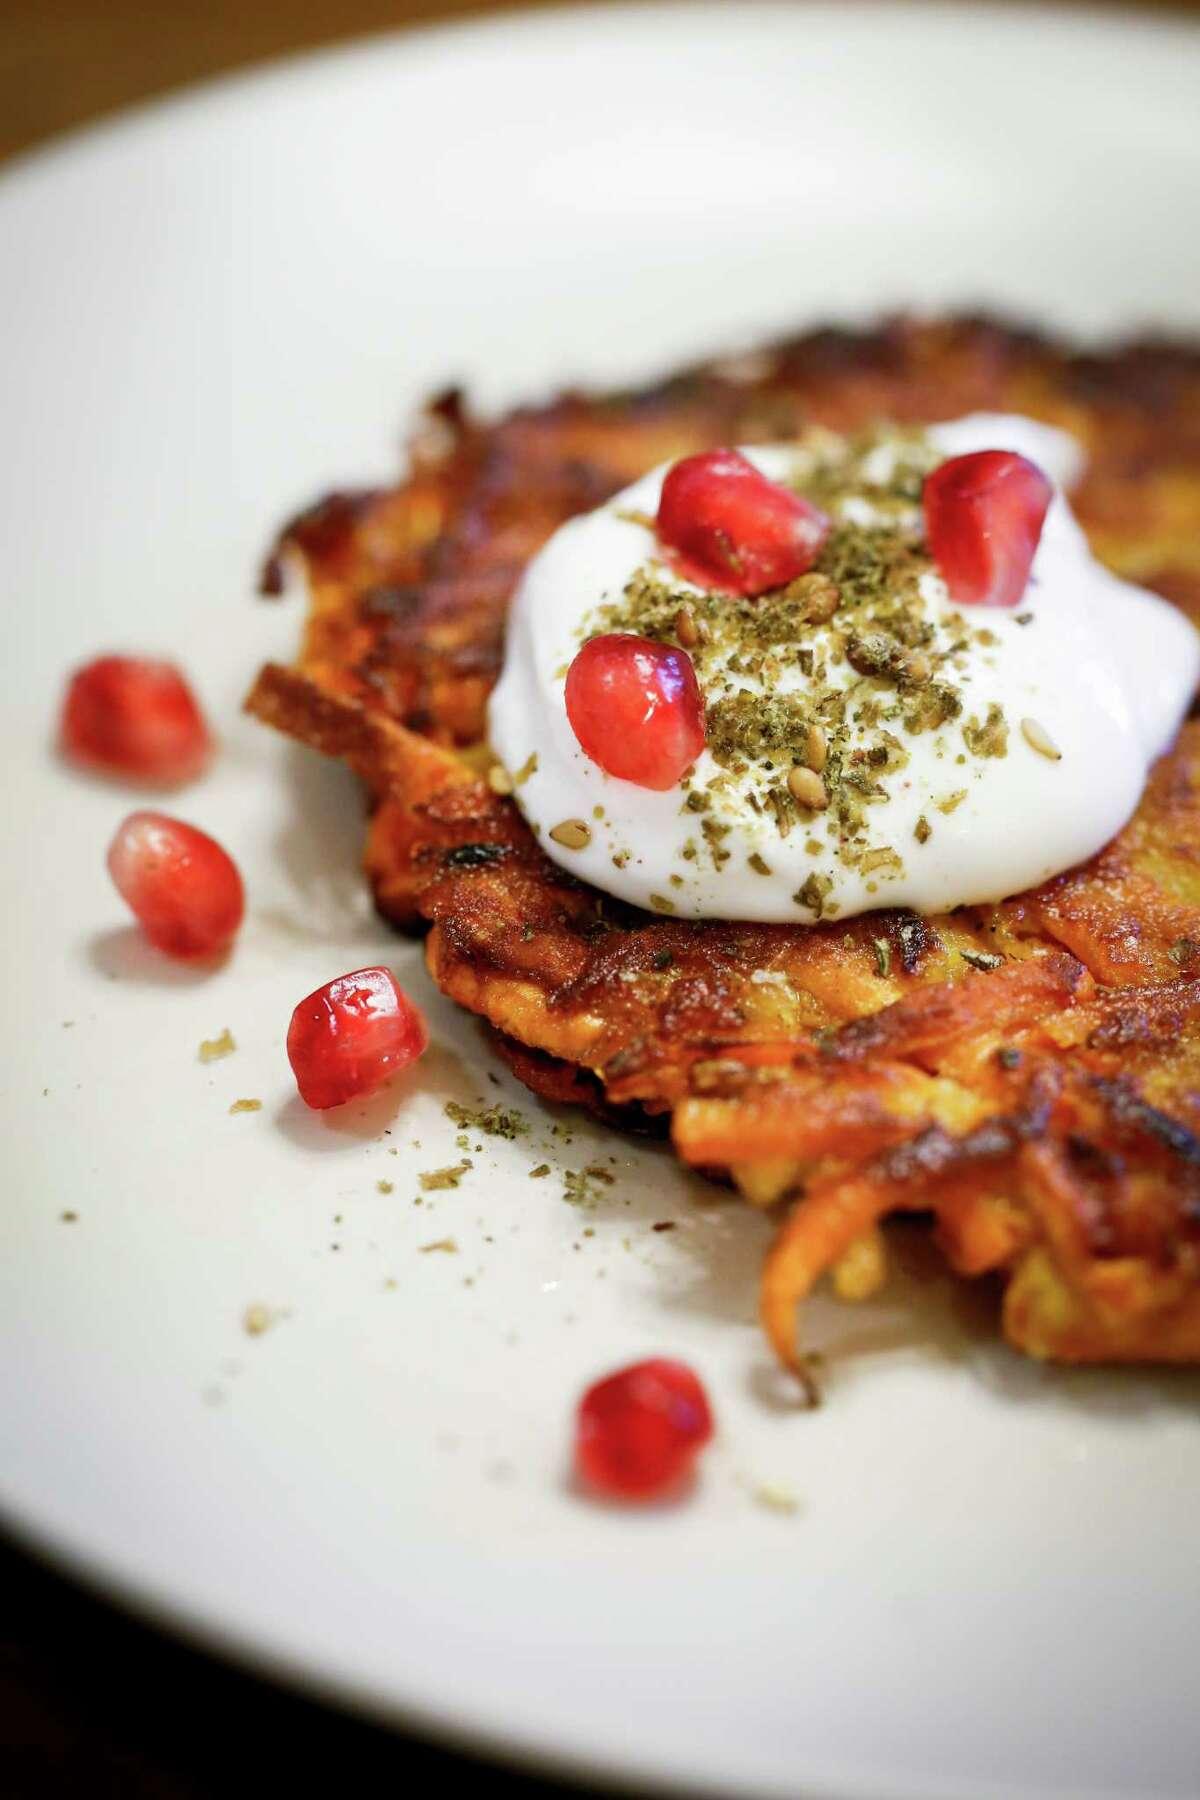 Sweet potato latkes made by Evan Bloom and Leo Beckerman of Wise Sons Jewish Delicatessen.